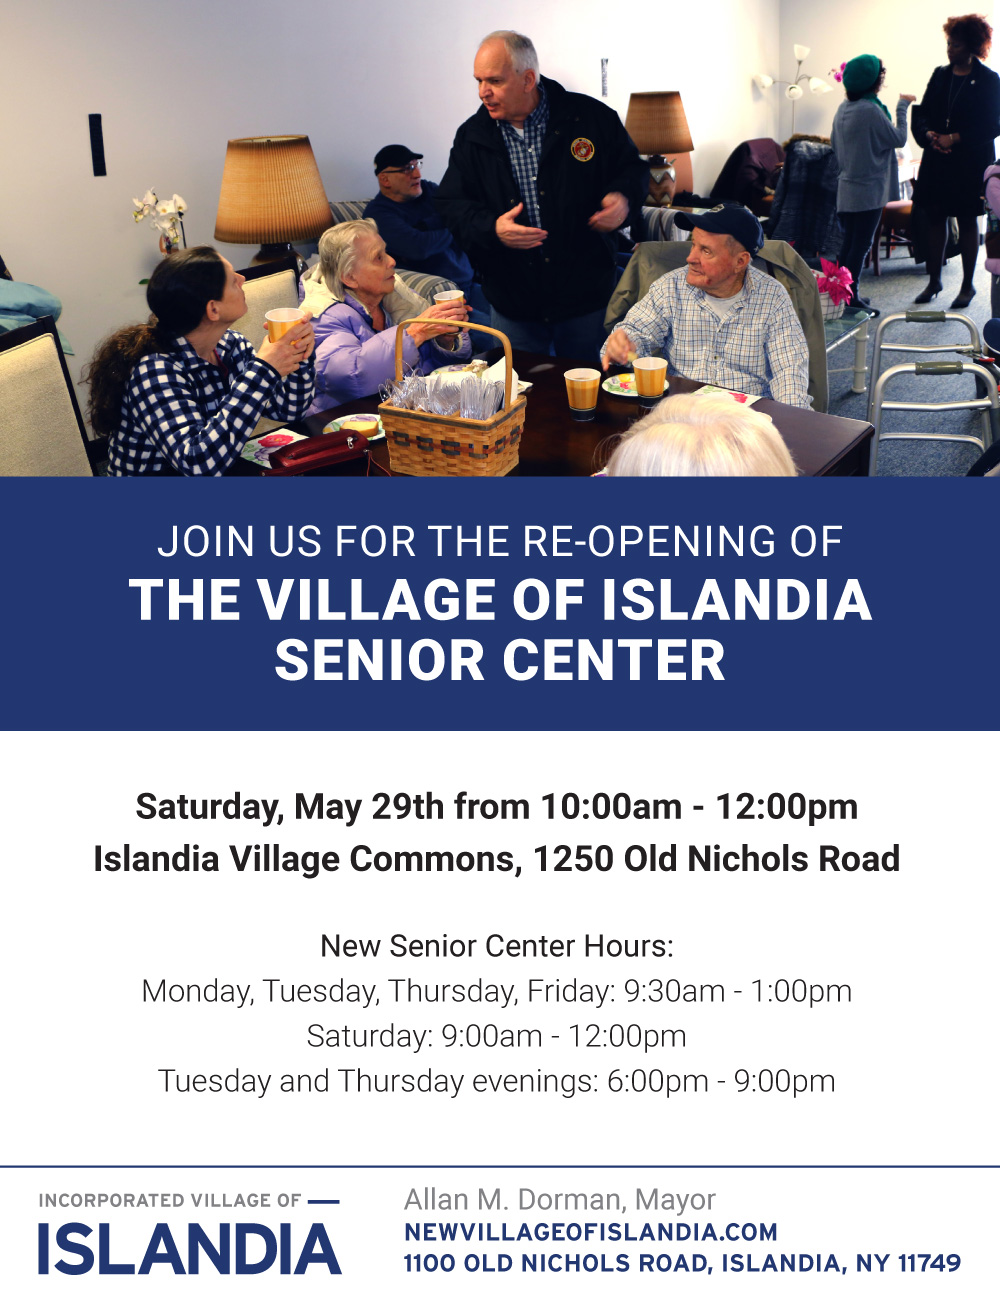 The Re-Opening of the Village of Islandia Senior Center